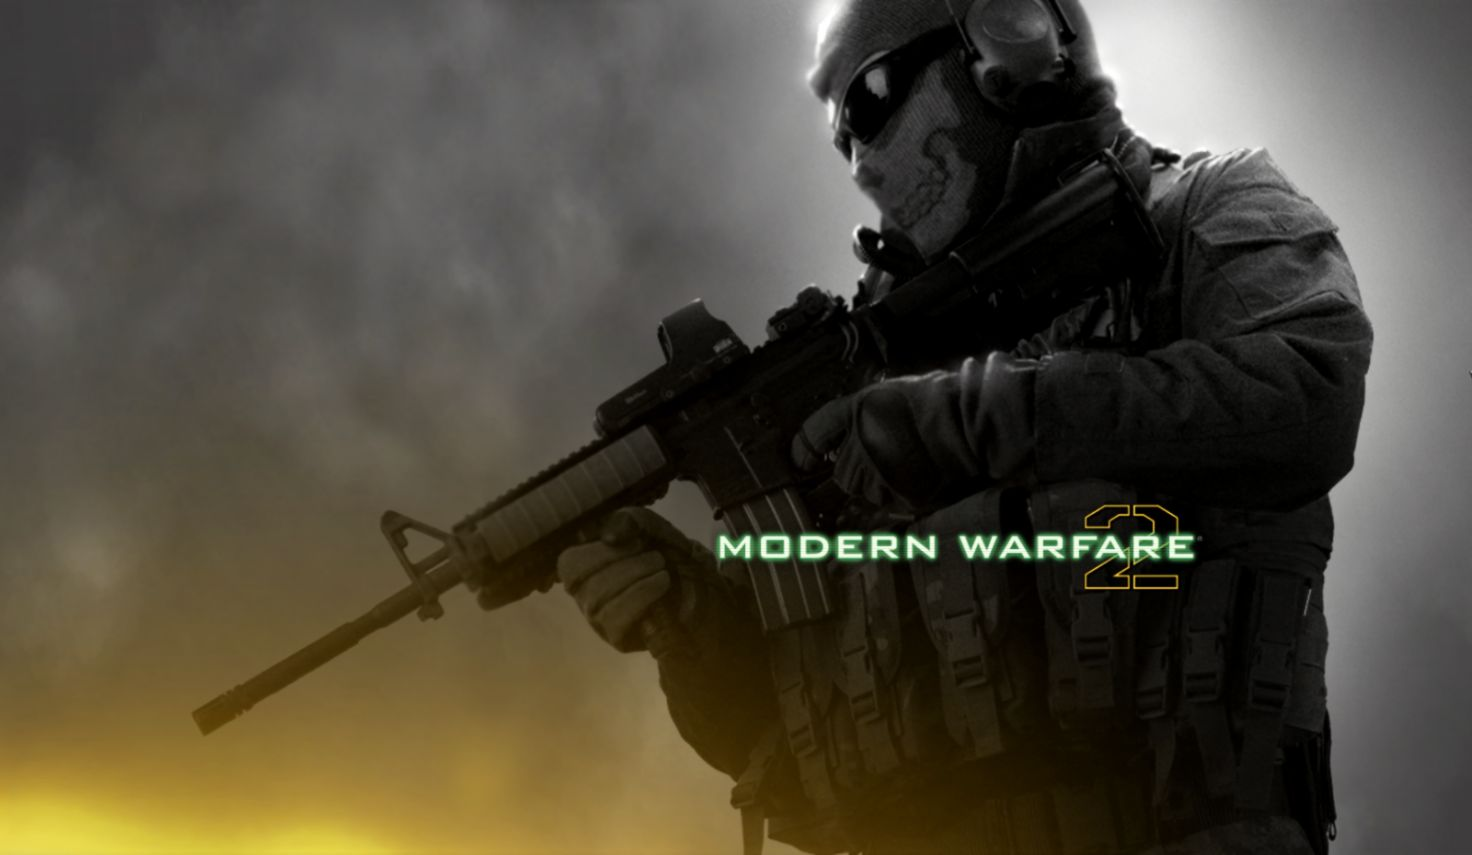 Download Call Of Duty Modern Warfare Wallpapers Hd